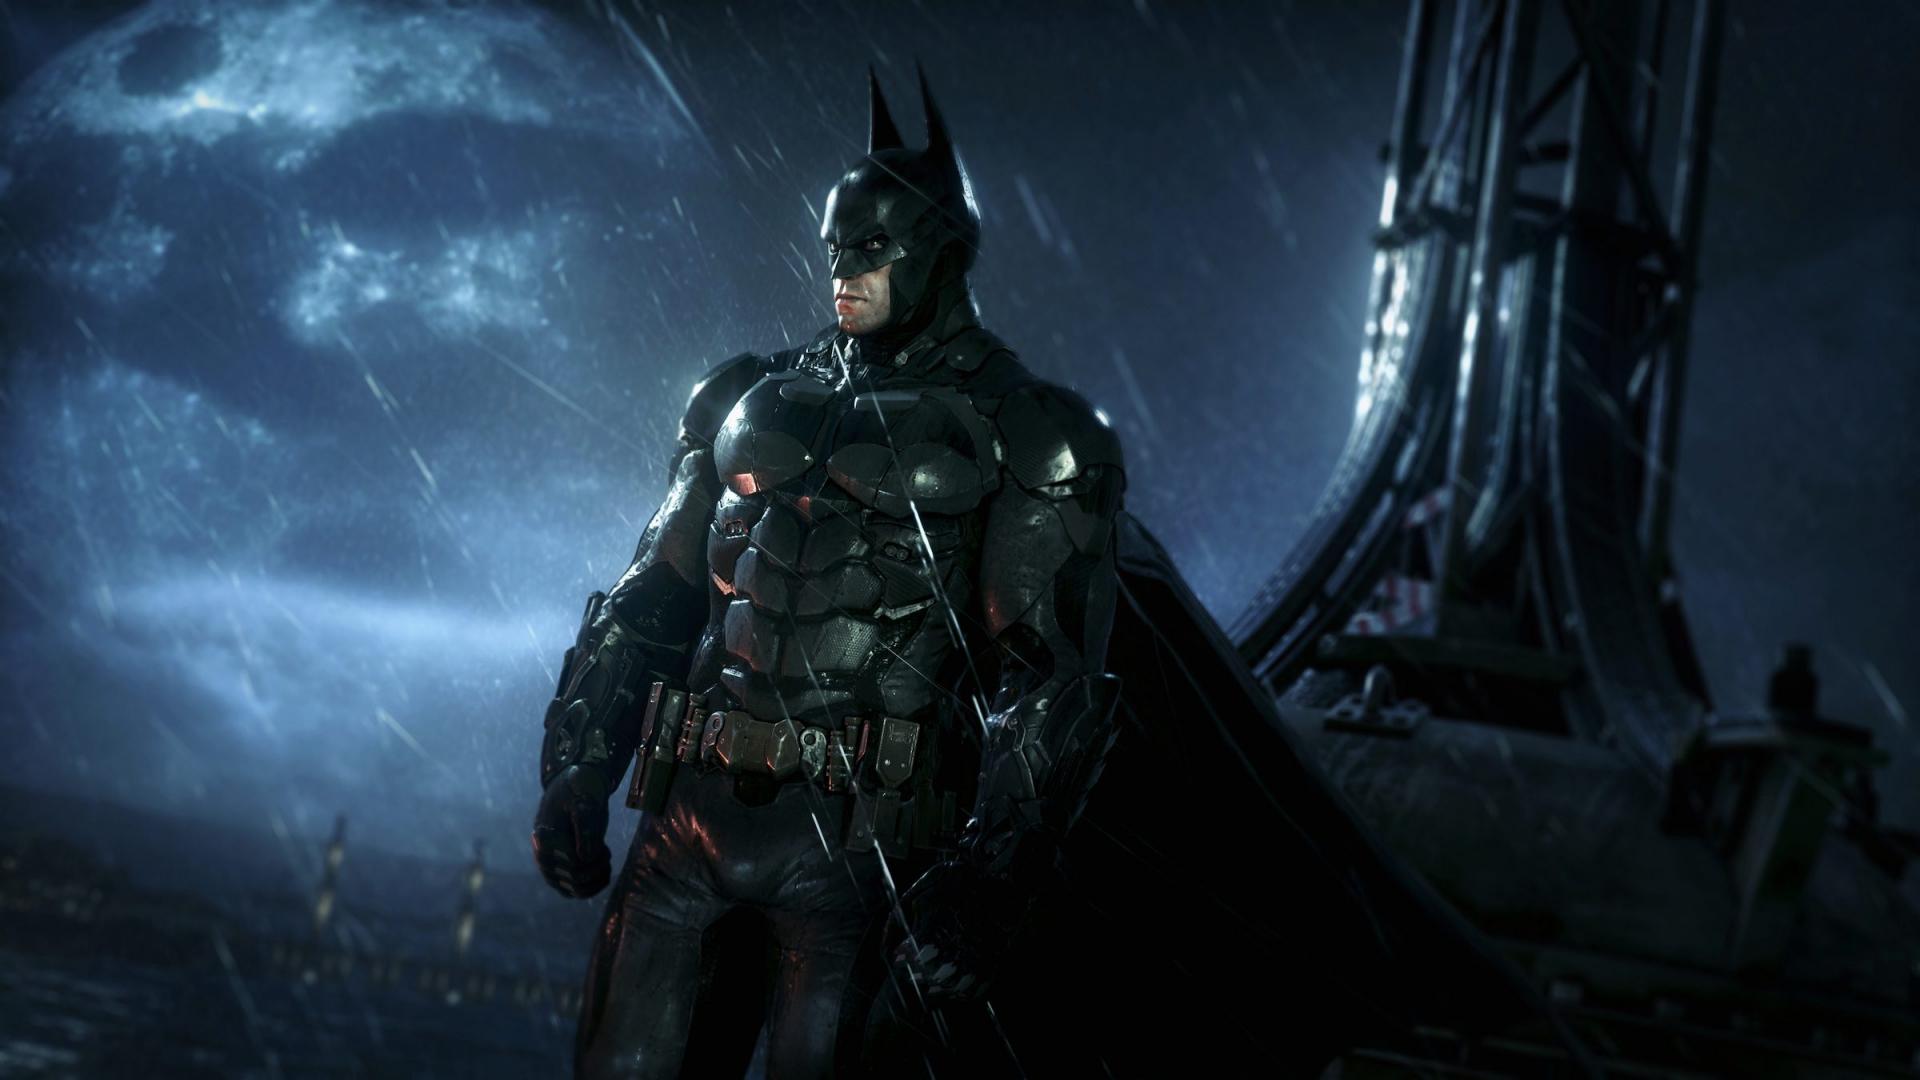 Free Download Batman Arkham Knight Hd Wallpapers Download